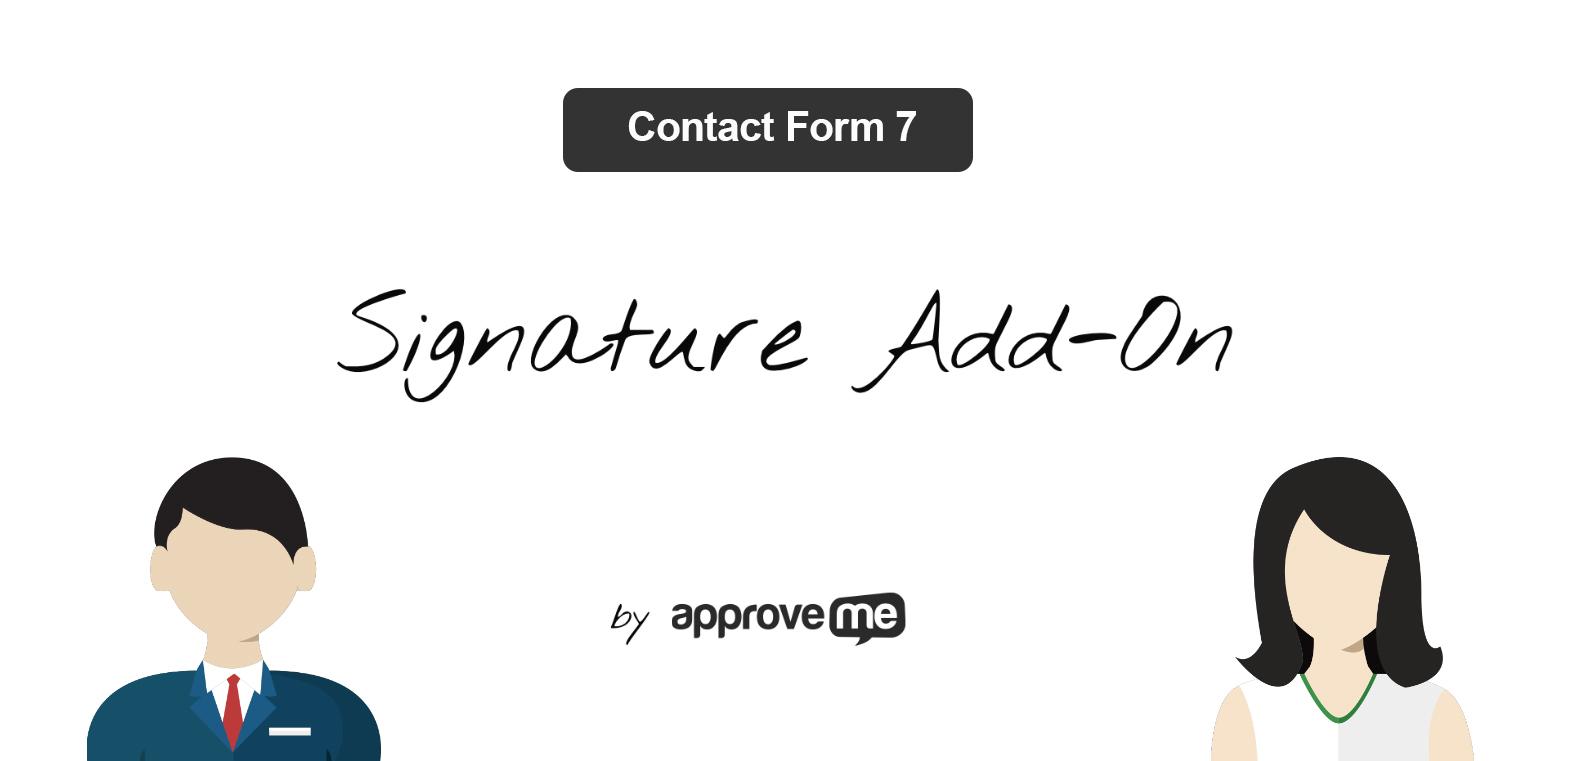 contact form 7 signature addon